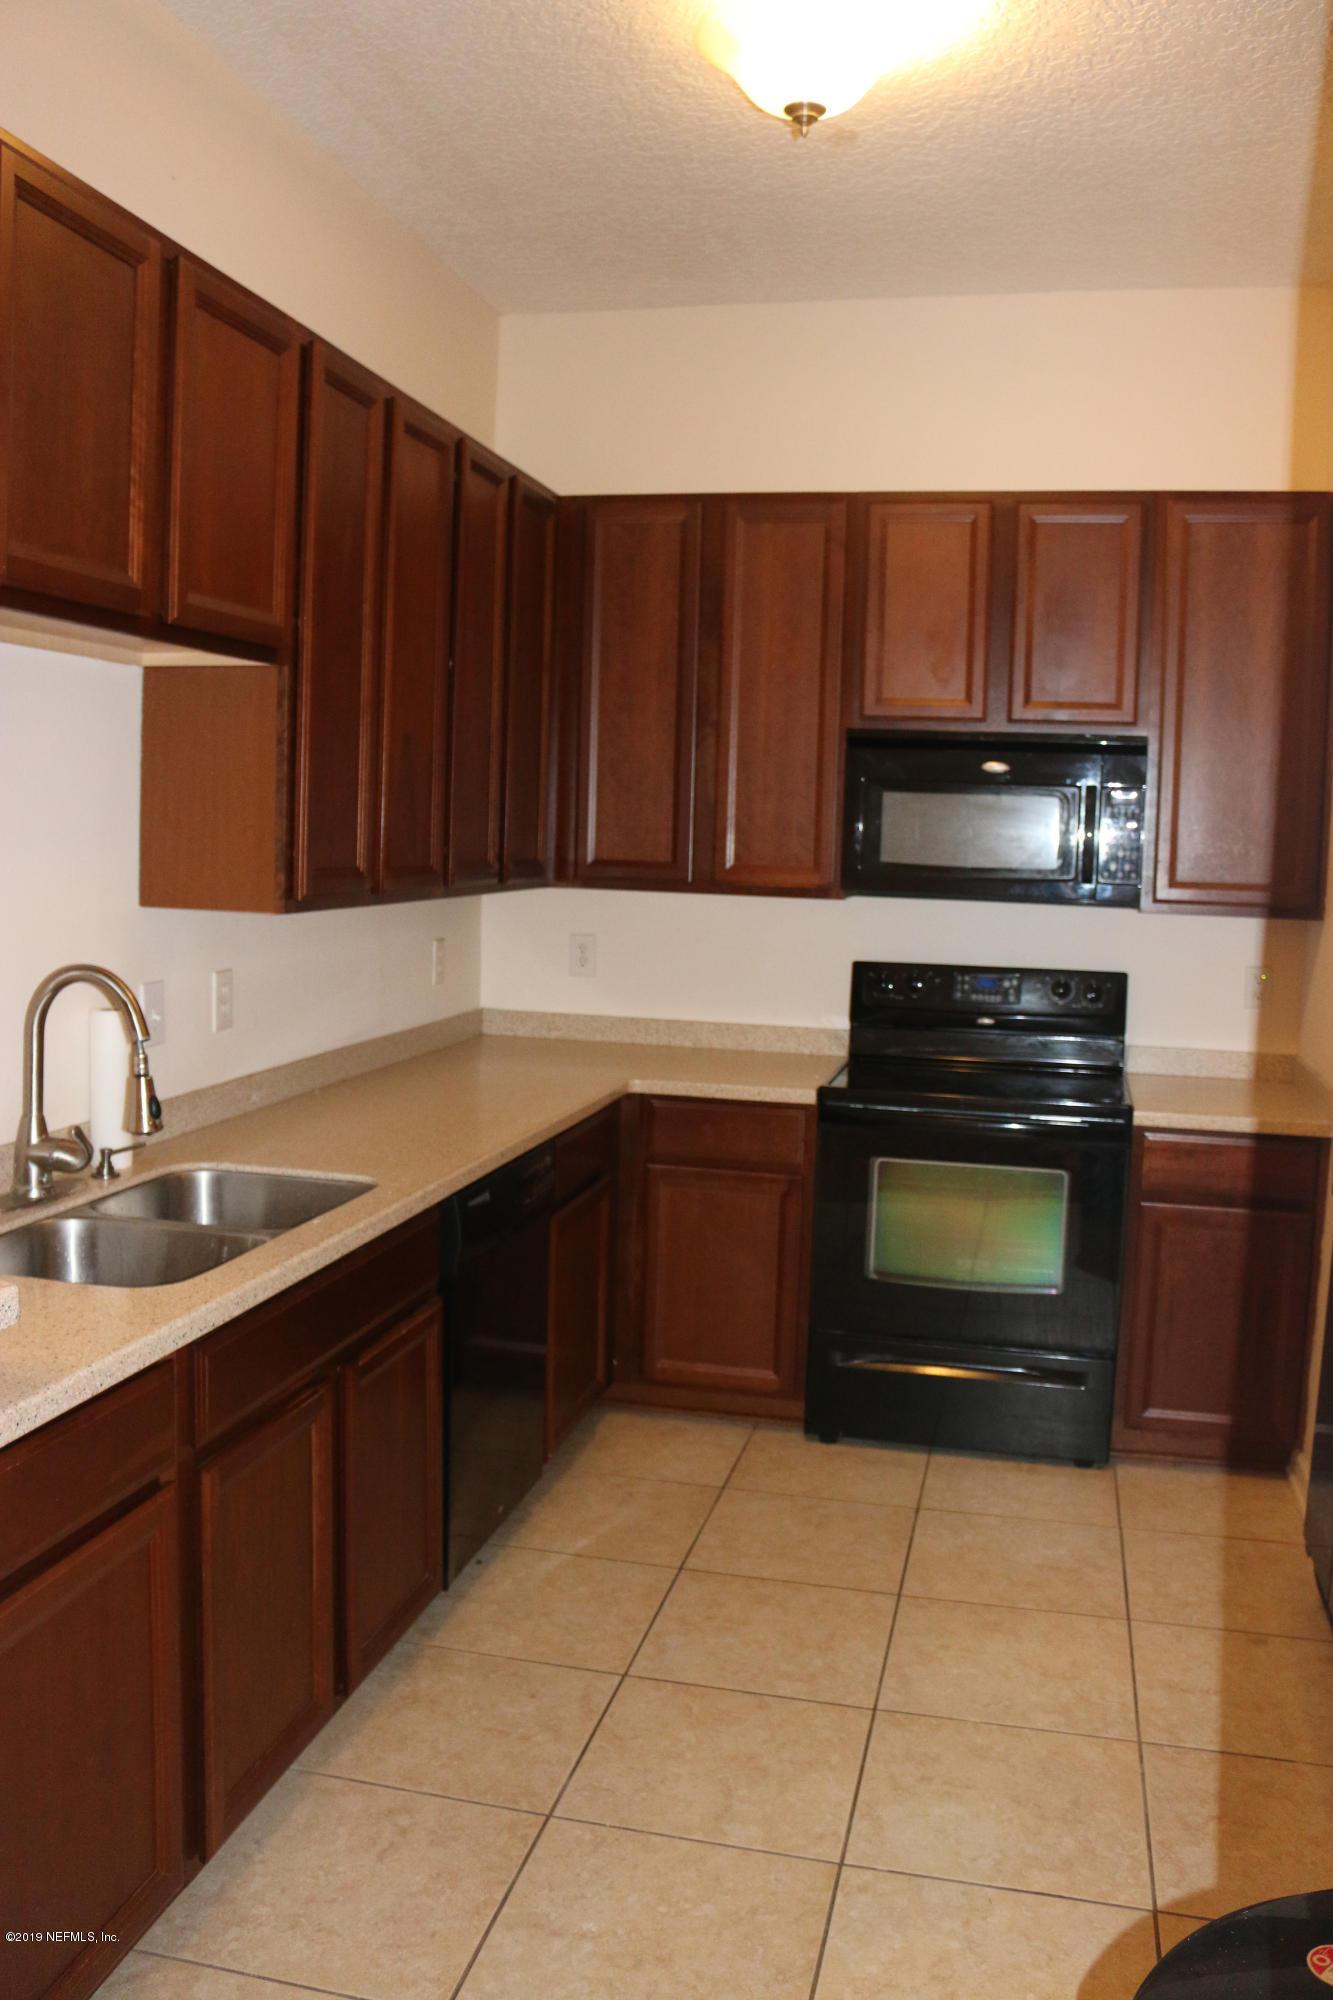 13840 HERONS LANDING- JACKSONVILLE- FLORIDA 32224, 3 Bedrooms Bedrooms, ,2 BathroomsBathrooms,Condo,For sale,HERONS LANDING,1015717